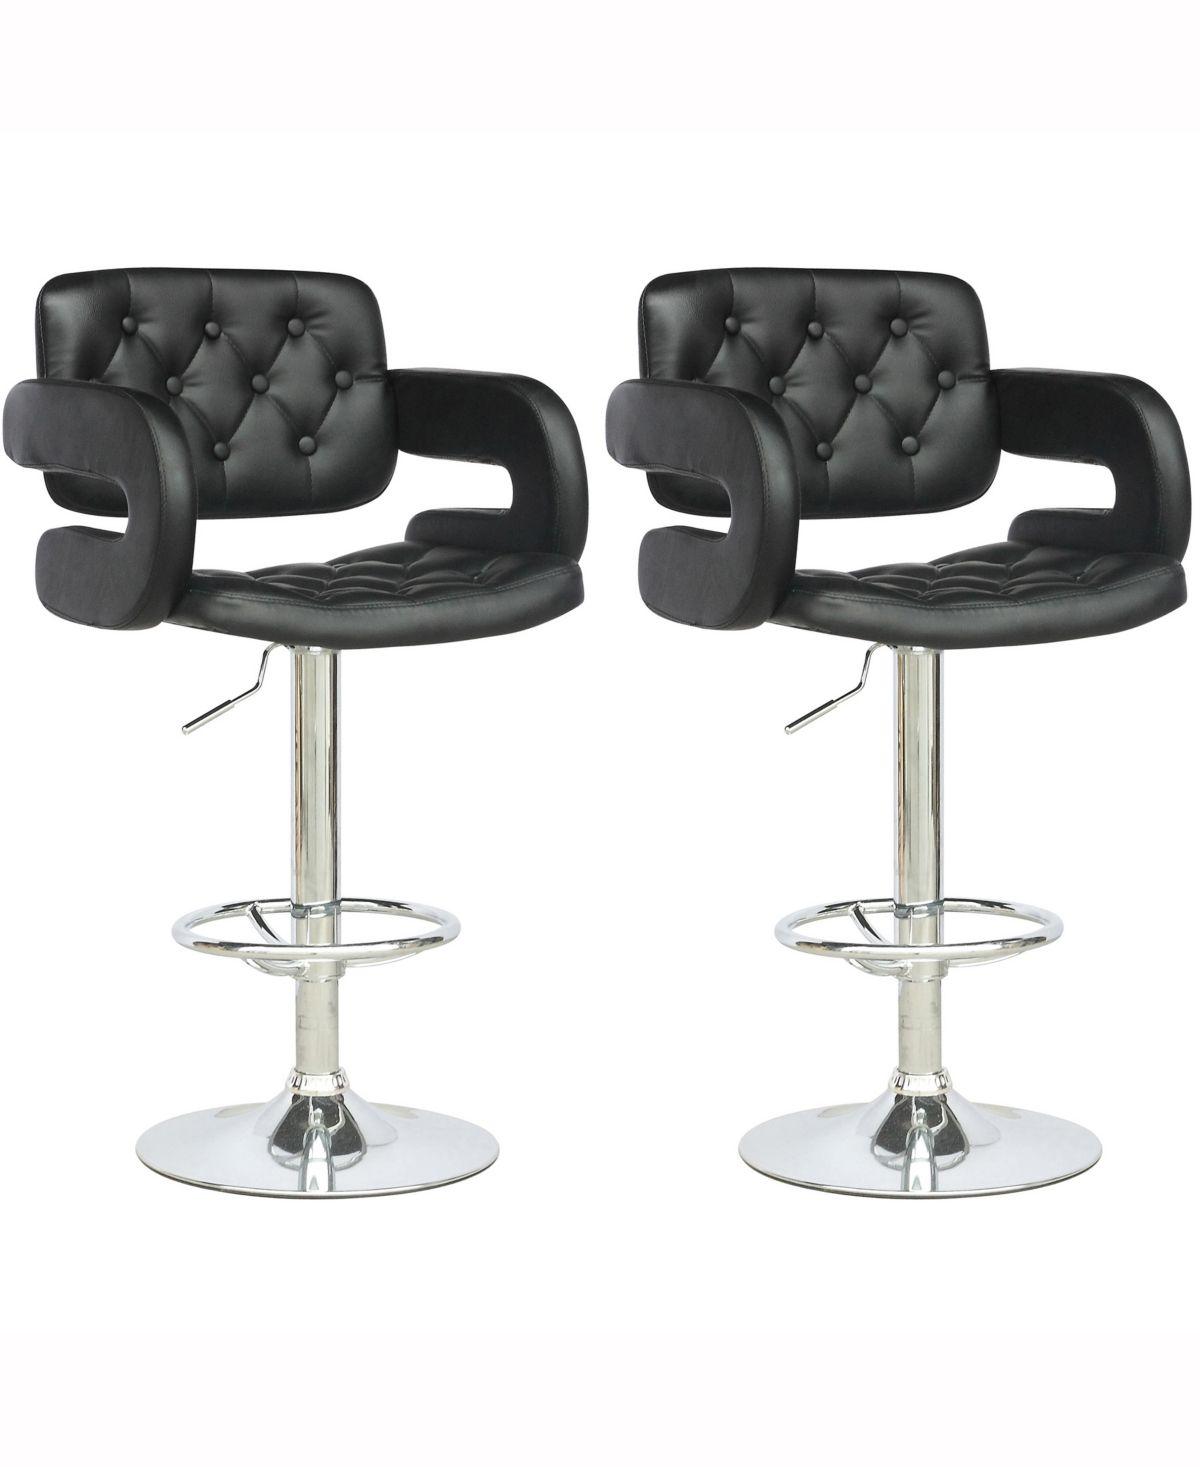 Corliving Adjustable Tufted Leatherette Barstool With Armrests